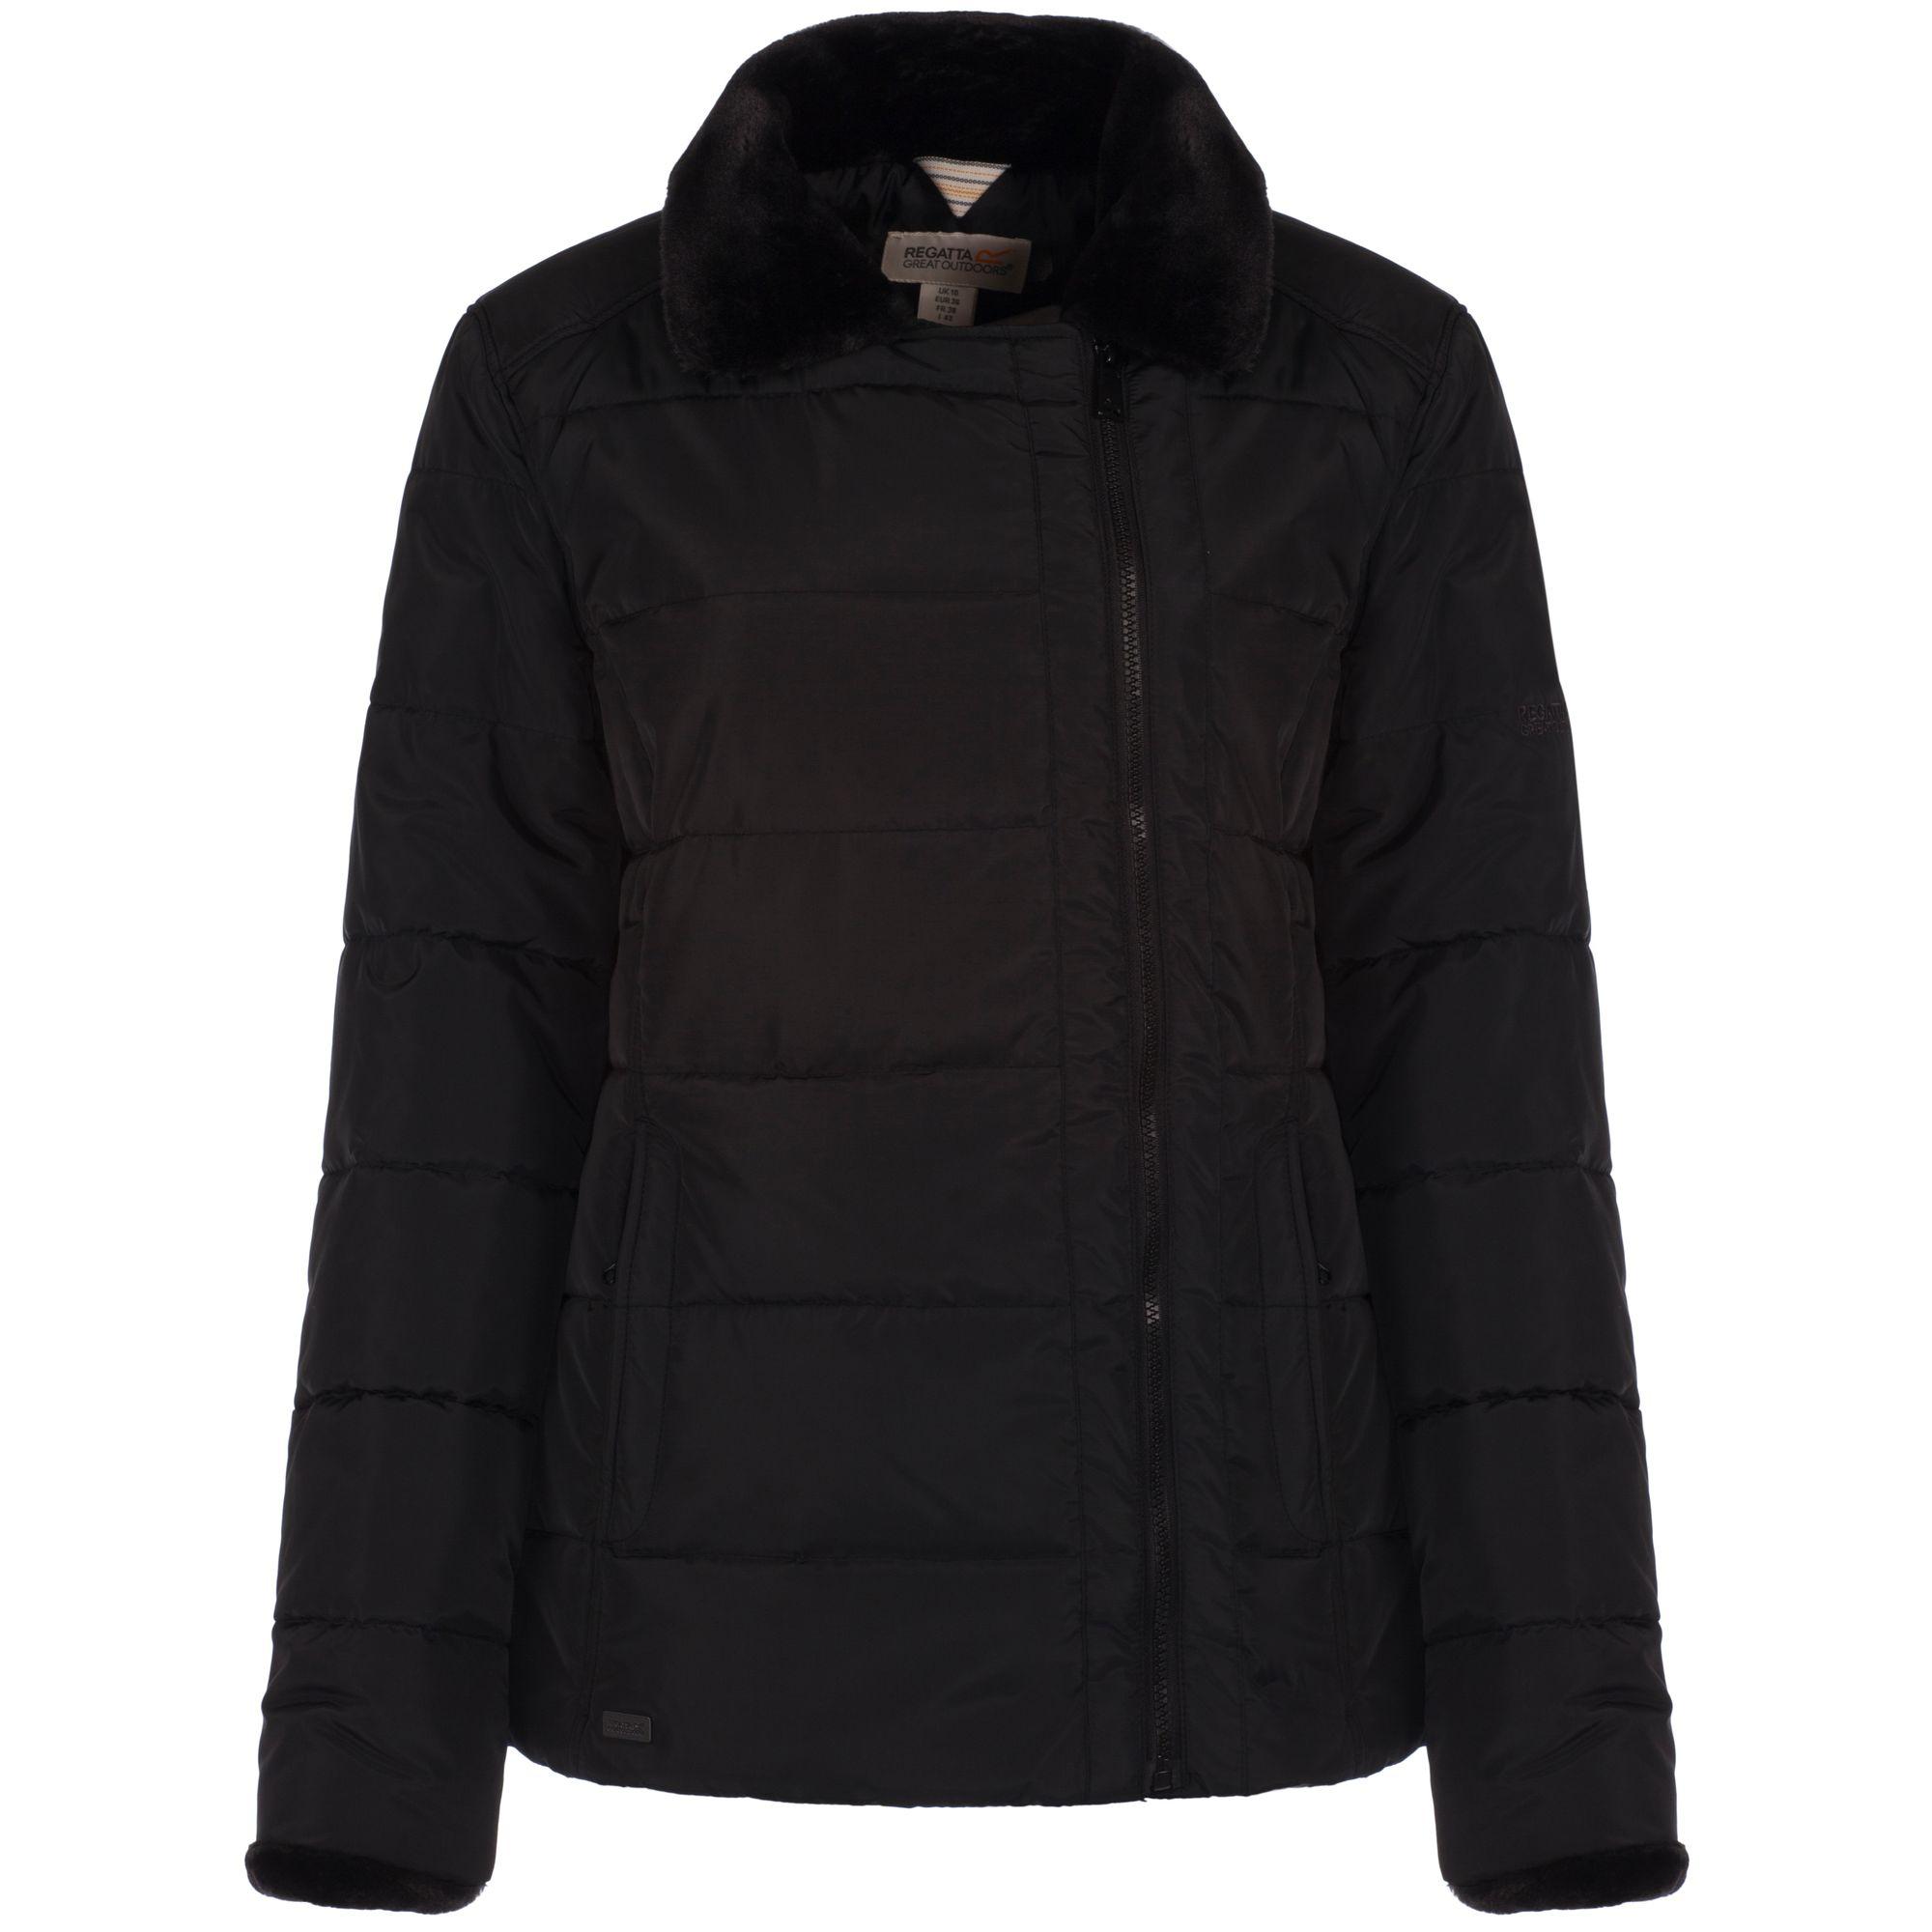 Regatta Great Outdoors Womens/Ladies Wren Showerproof Winter Jacket (14) (Black)